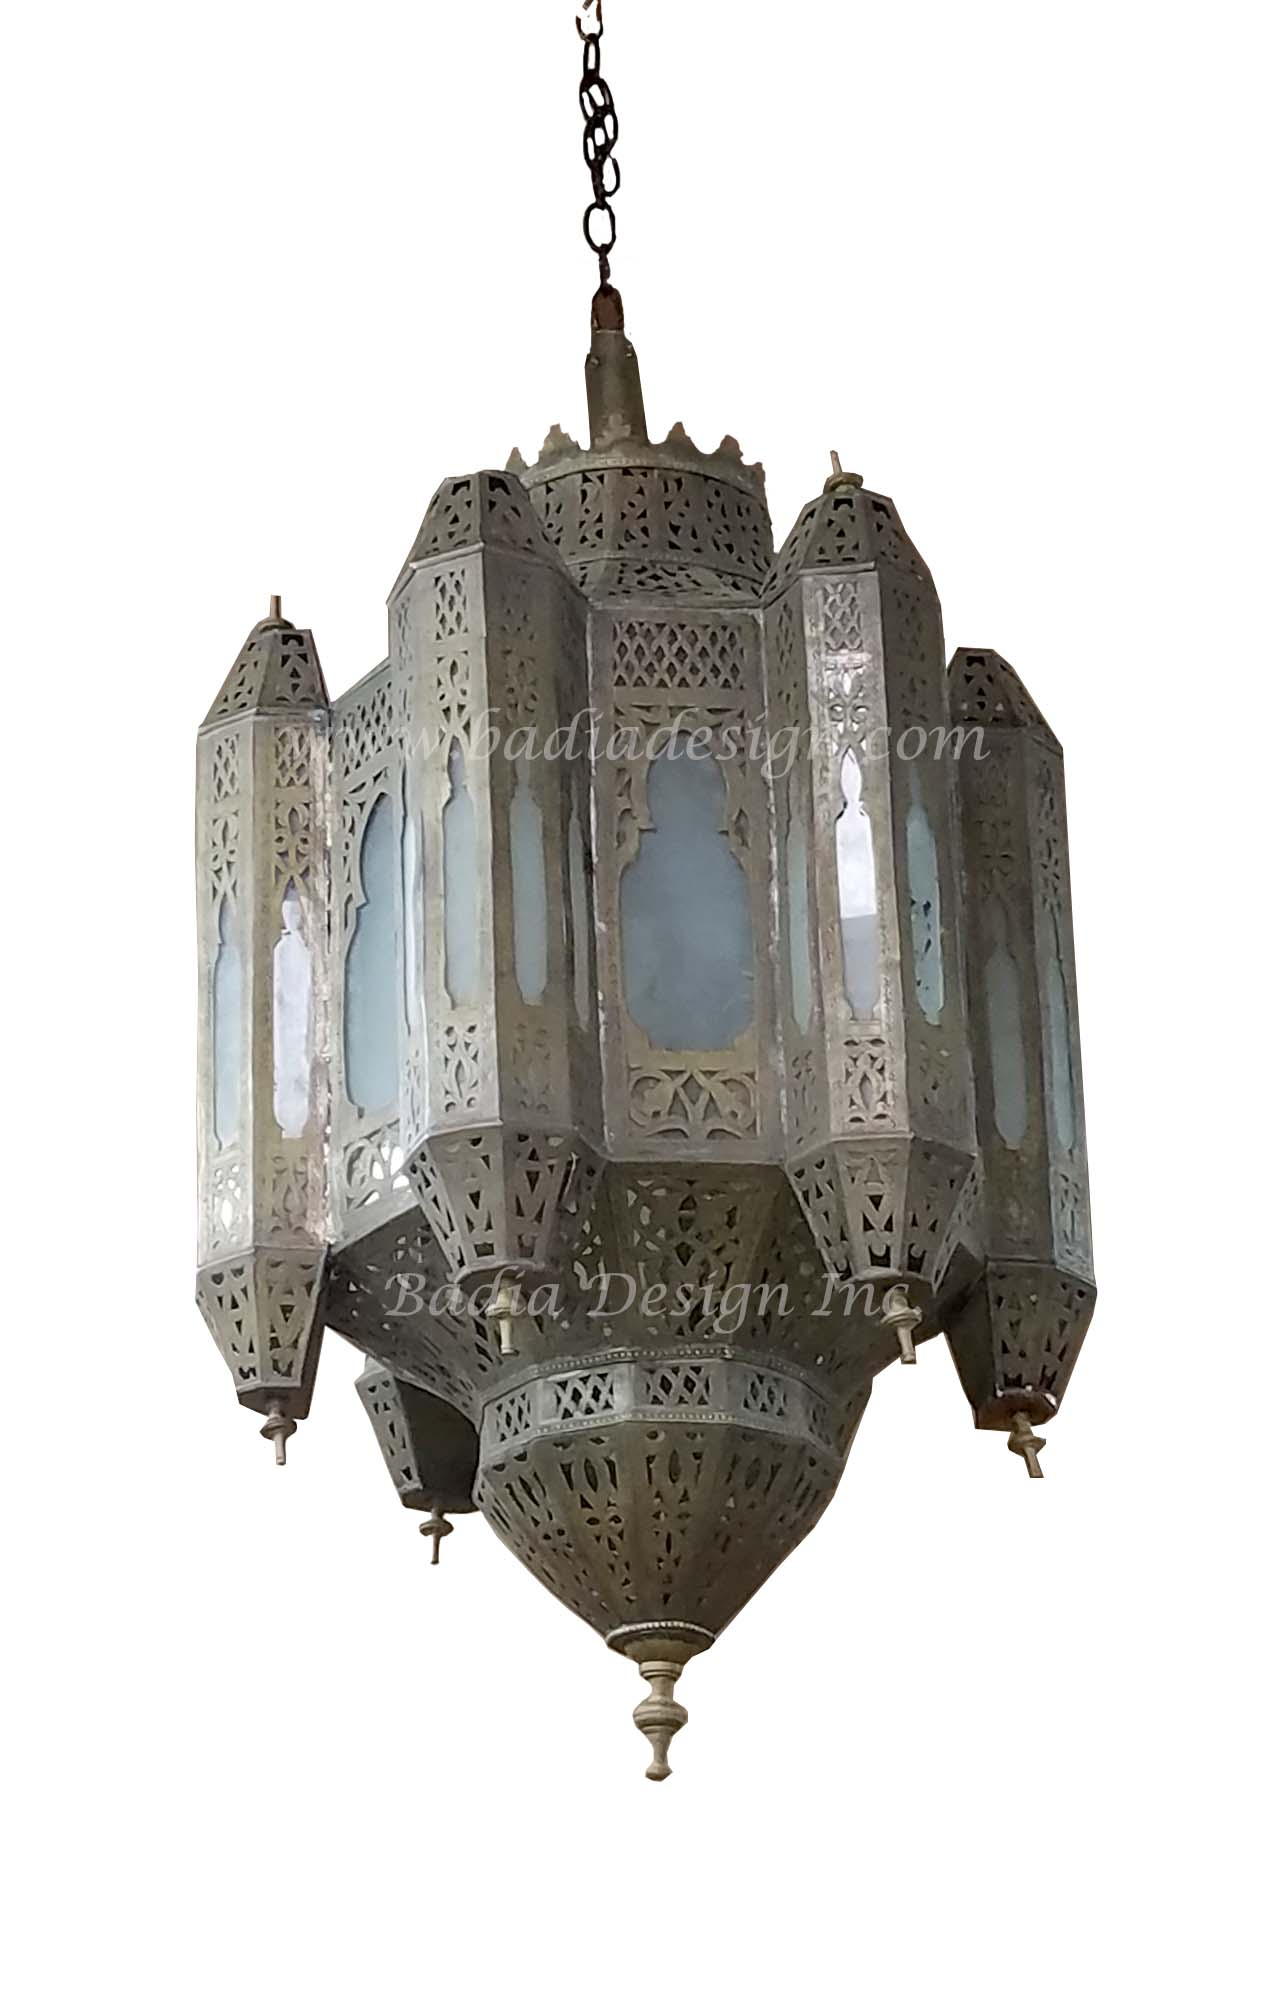 moroccan-brass-chandelier-with-white-glass-ch201.jpg